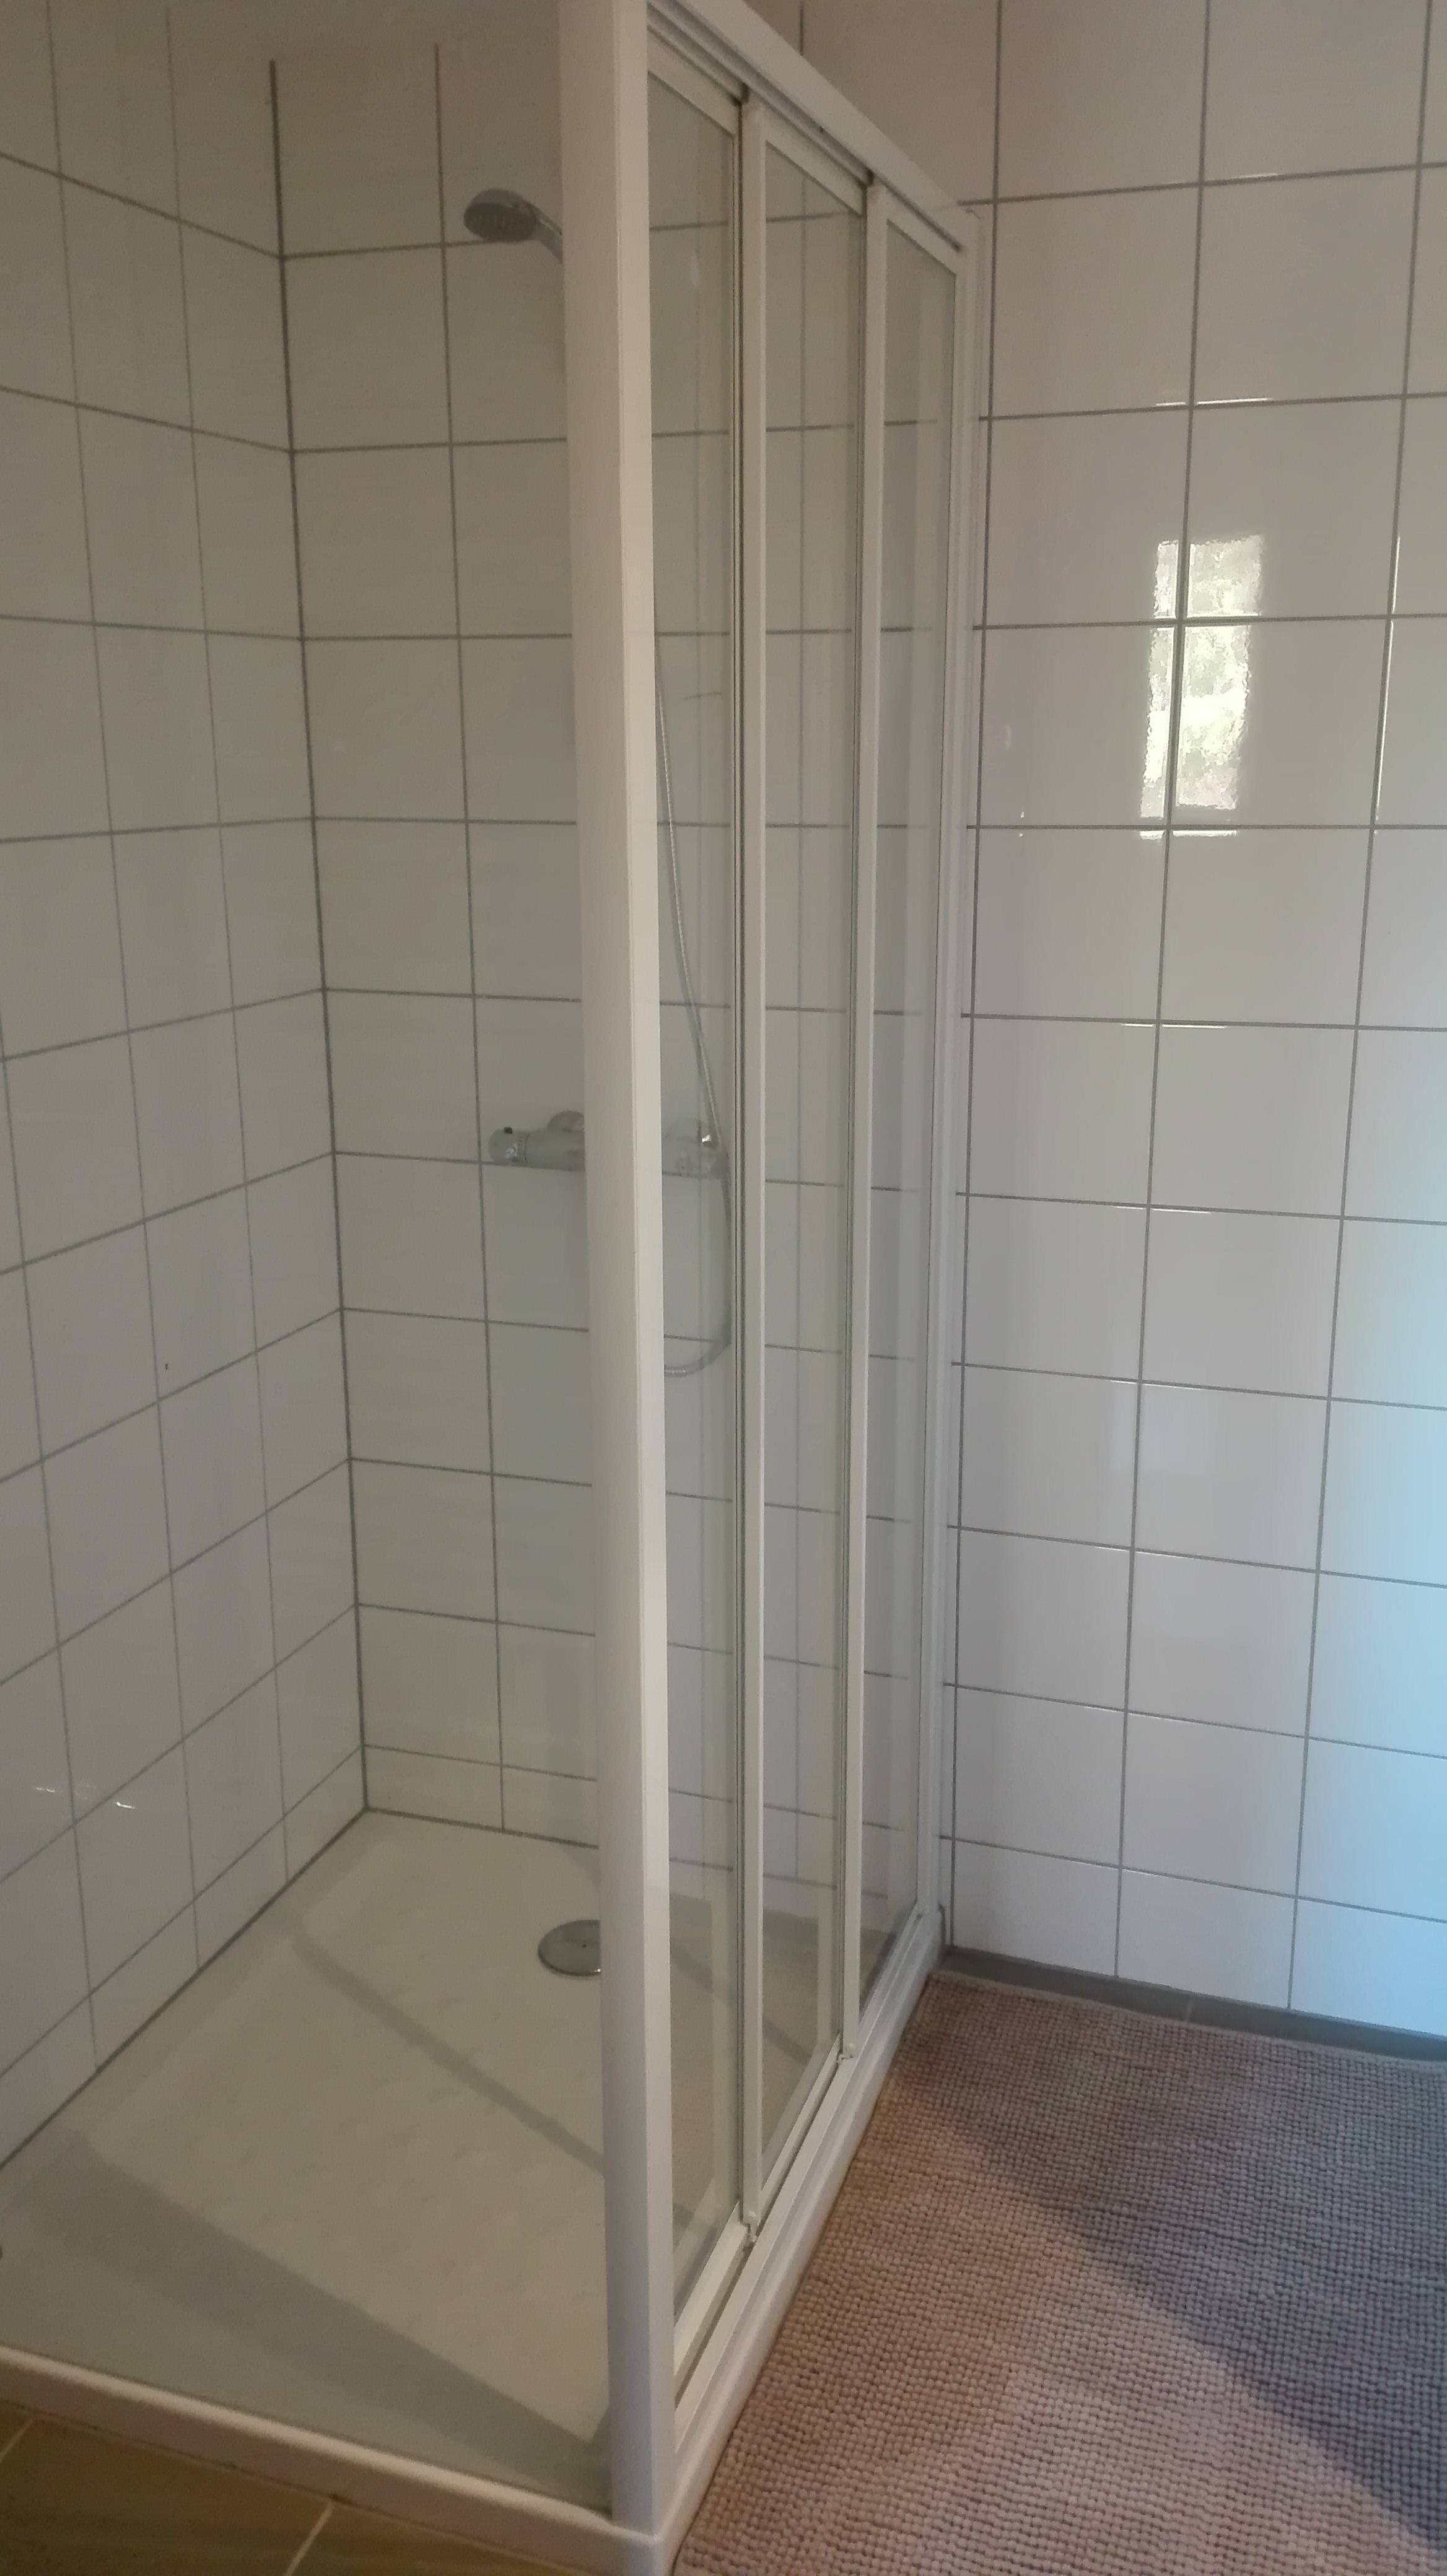 Gîte Salle de bain 1